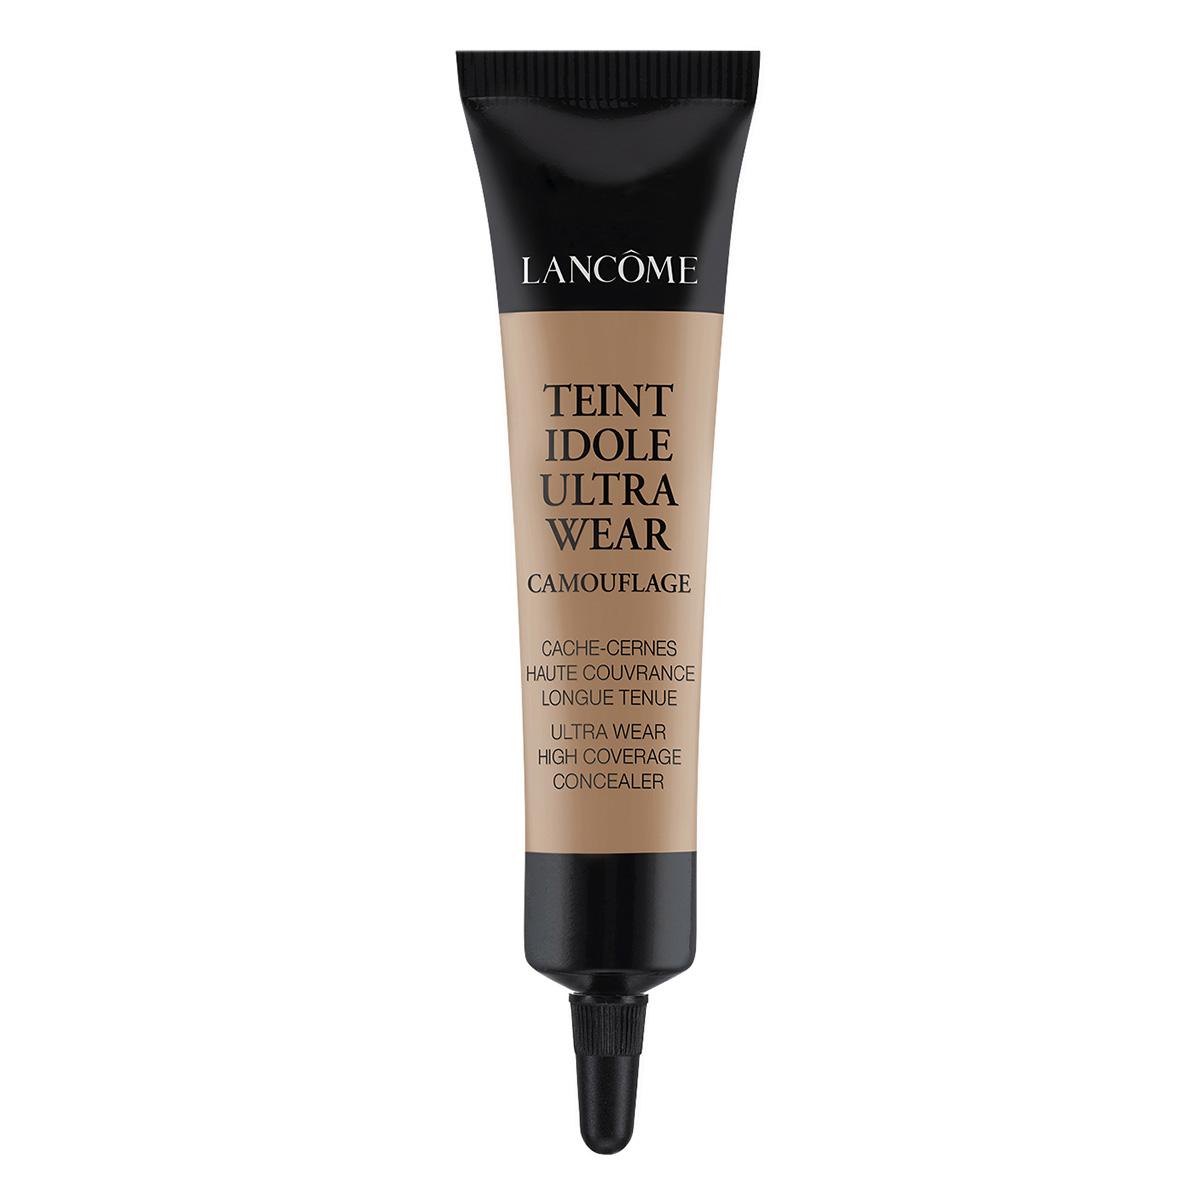 Lancôme - Teint Idole Ultra Wear Camouflage - Anti-cernes